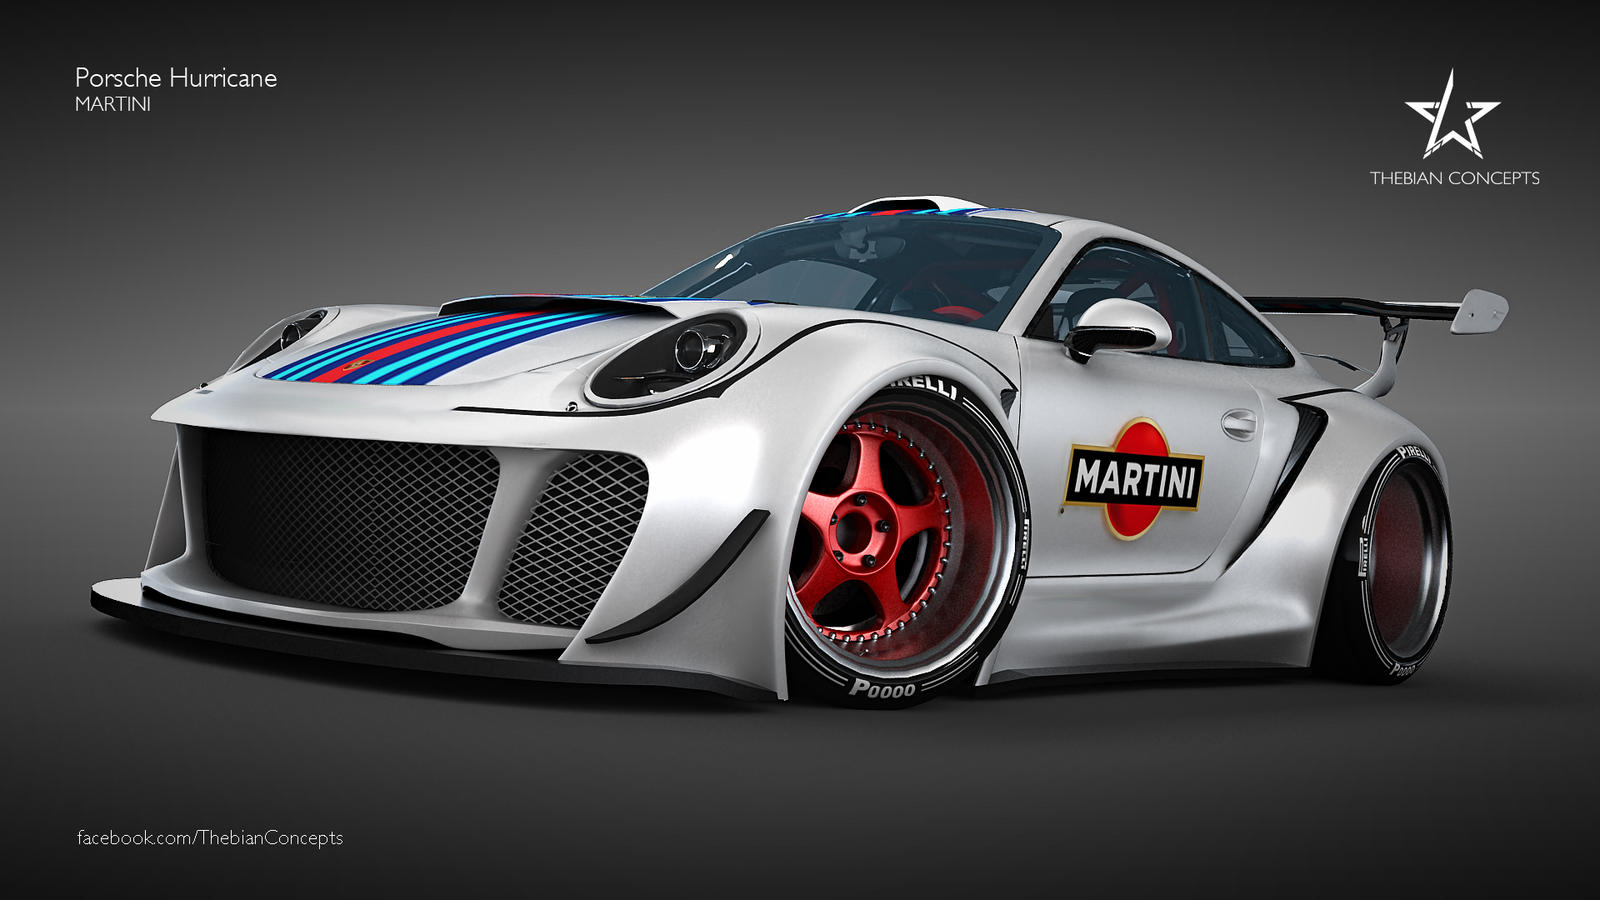 Monster Porsche Hurricane Concept Design: PORSCHE HURRICANE MARTINI By Mcmercslr On DeviantArt